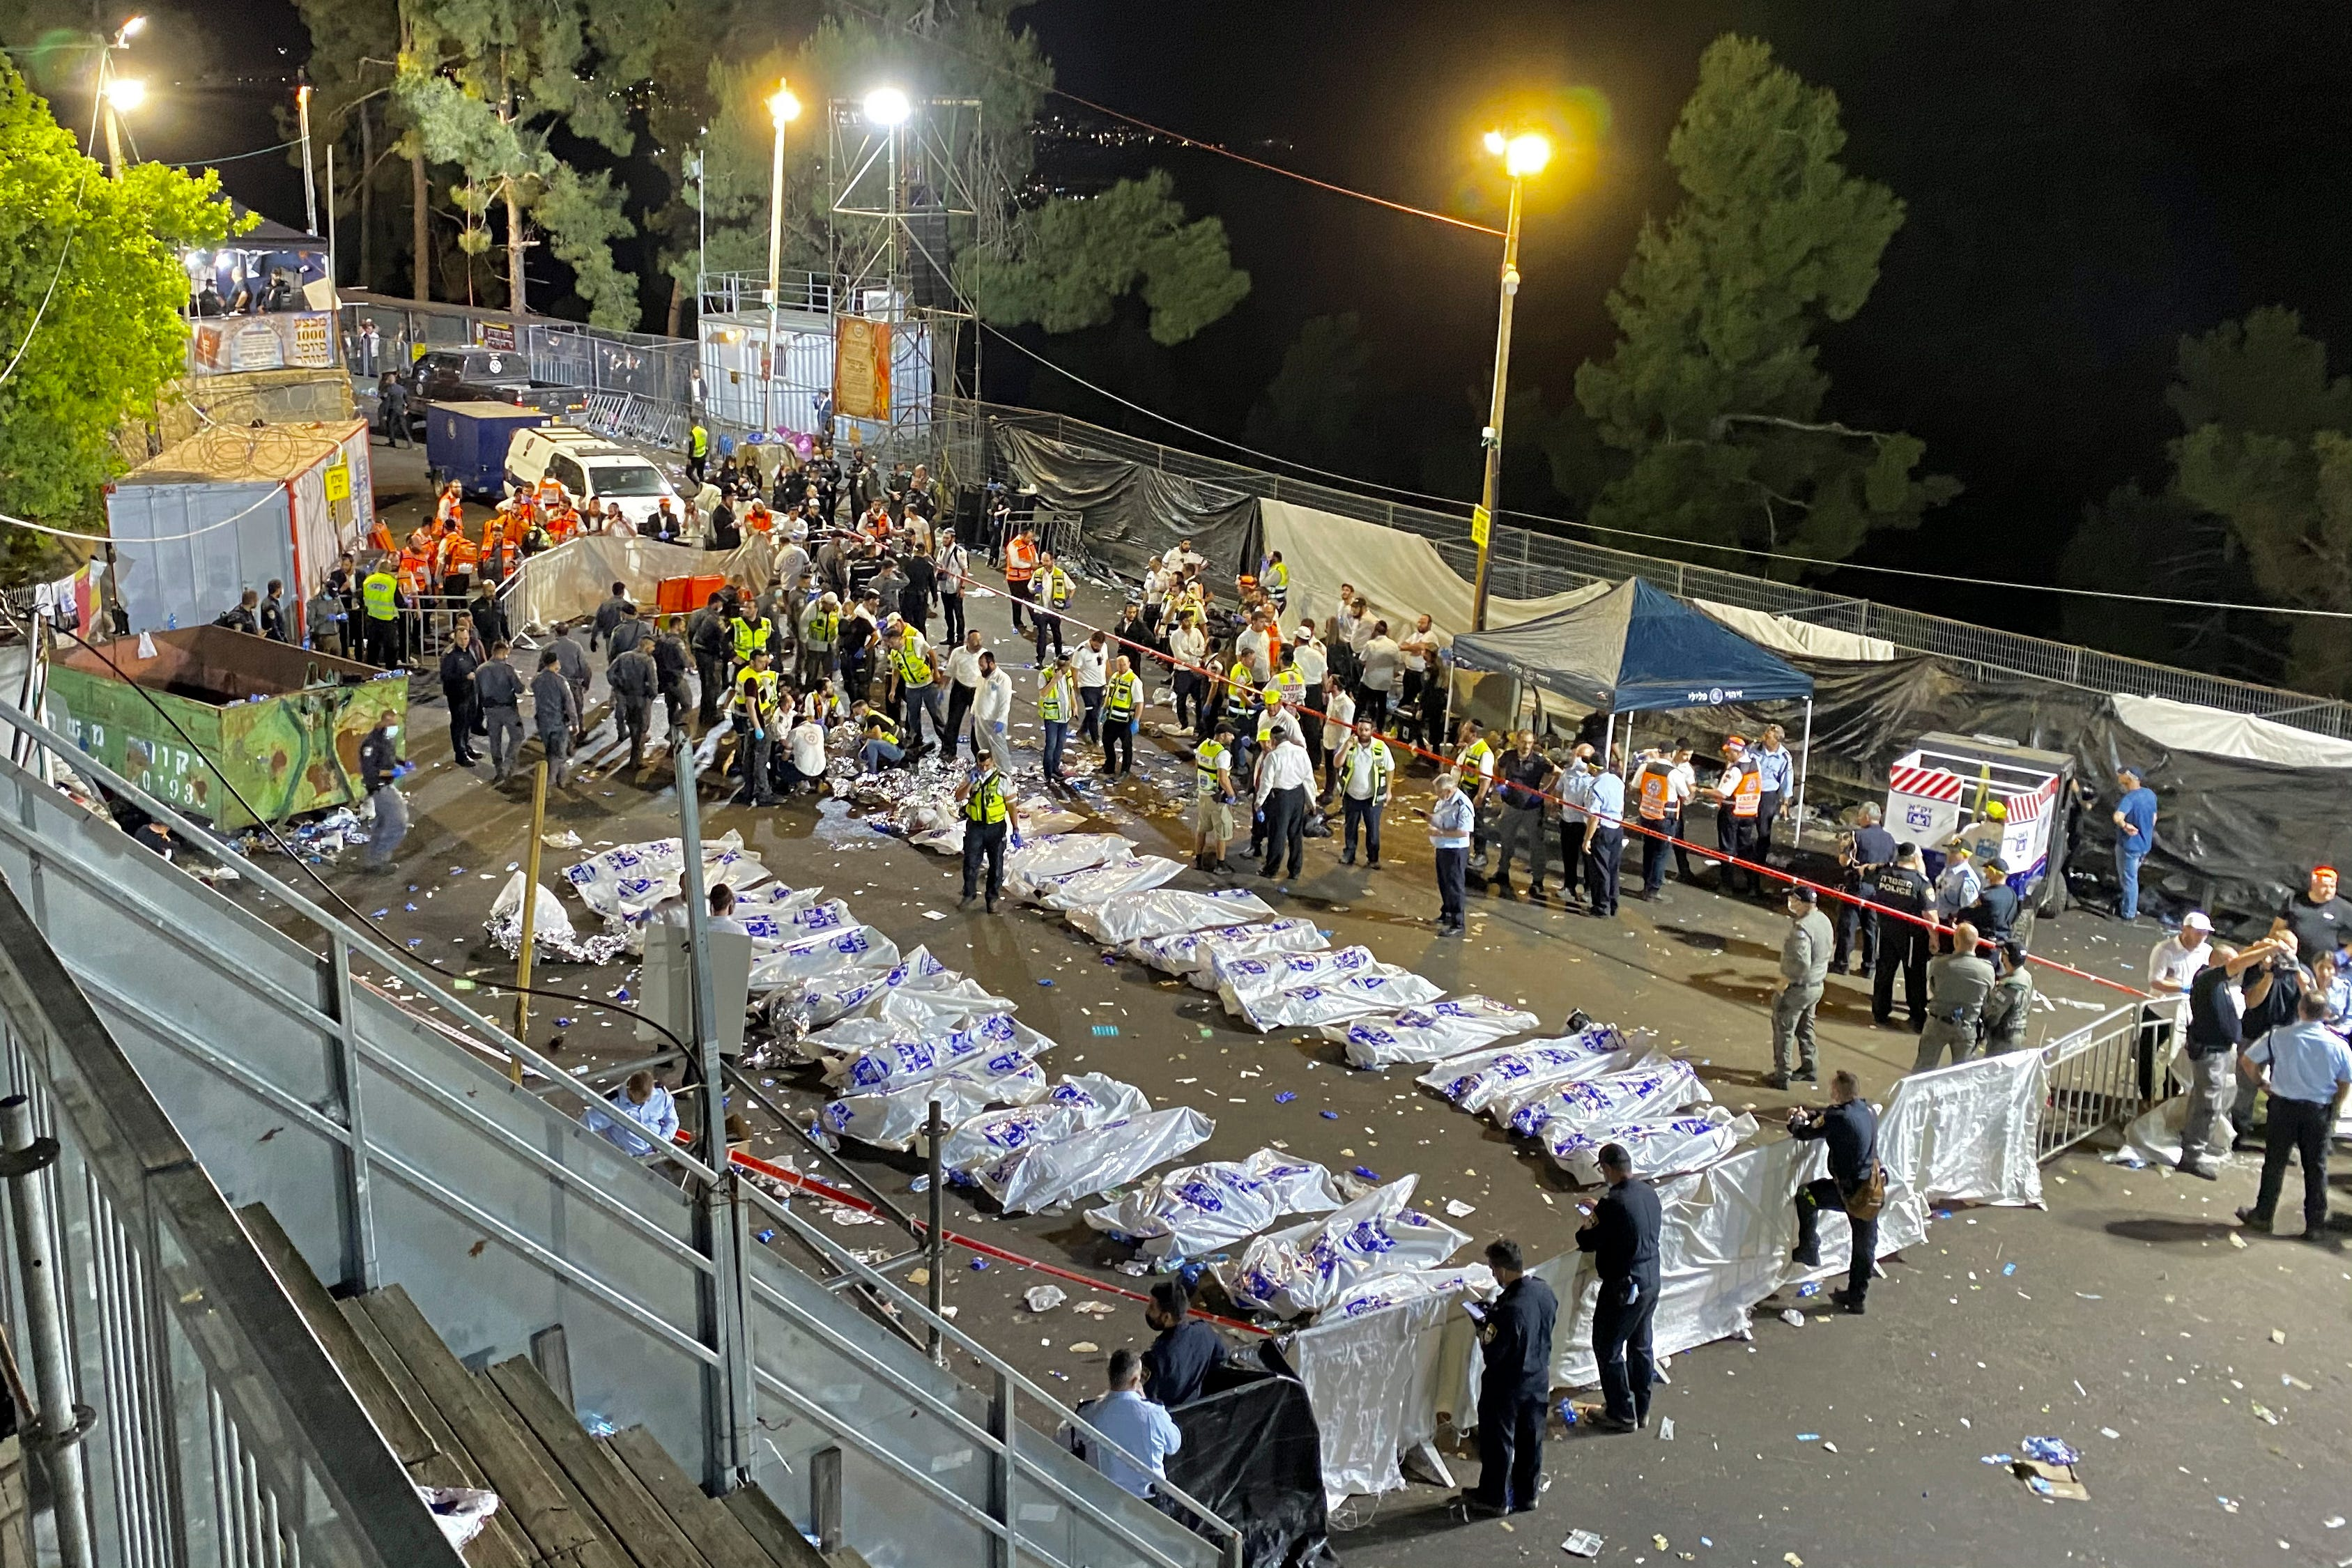 Religious festival stampede in Israel kills 44, hurts dozens 1